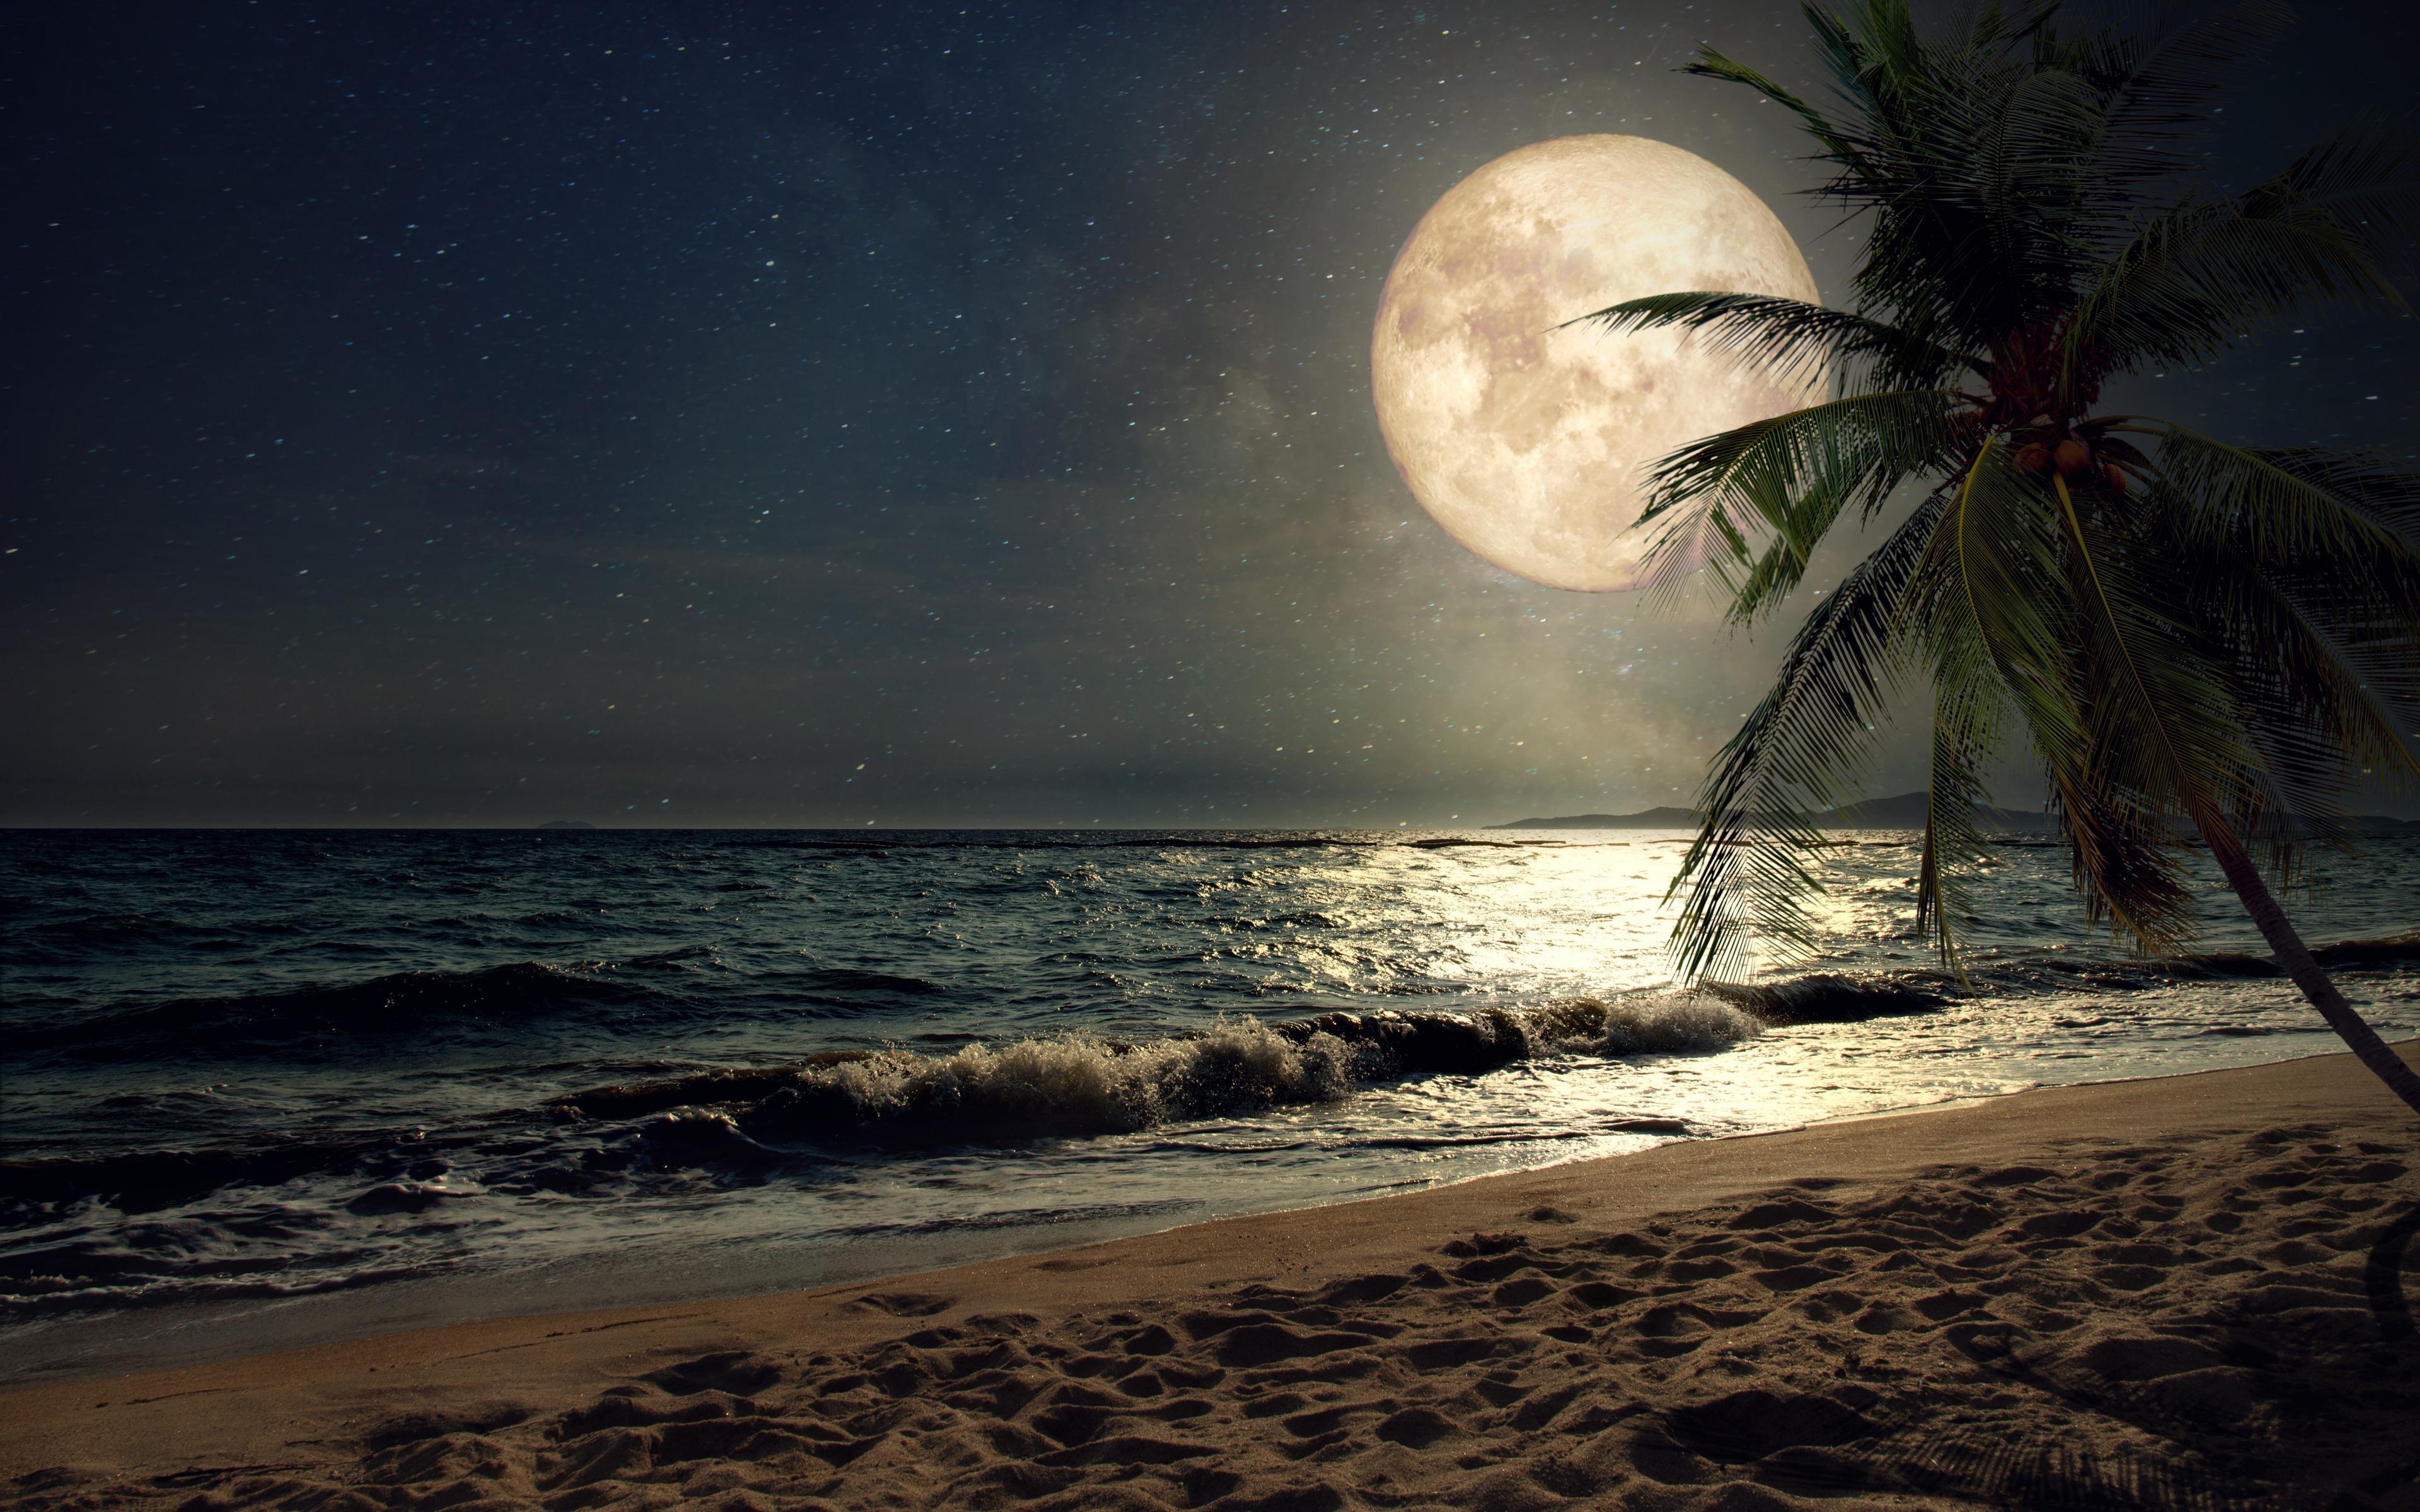 Download 3840x2400 Wallpaper Beach Sand Night S Moon Palm Tree